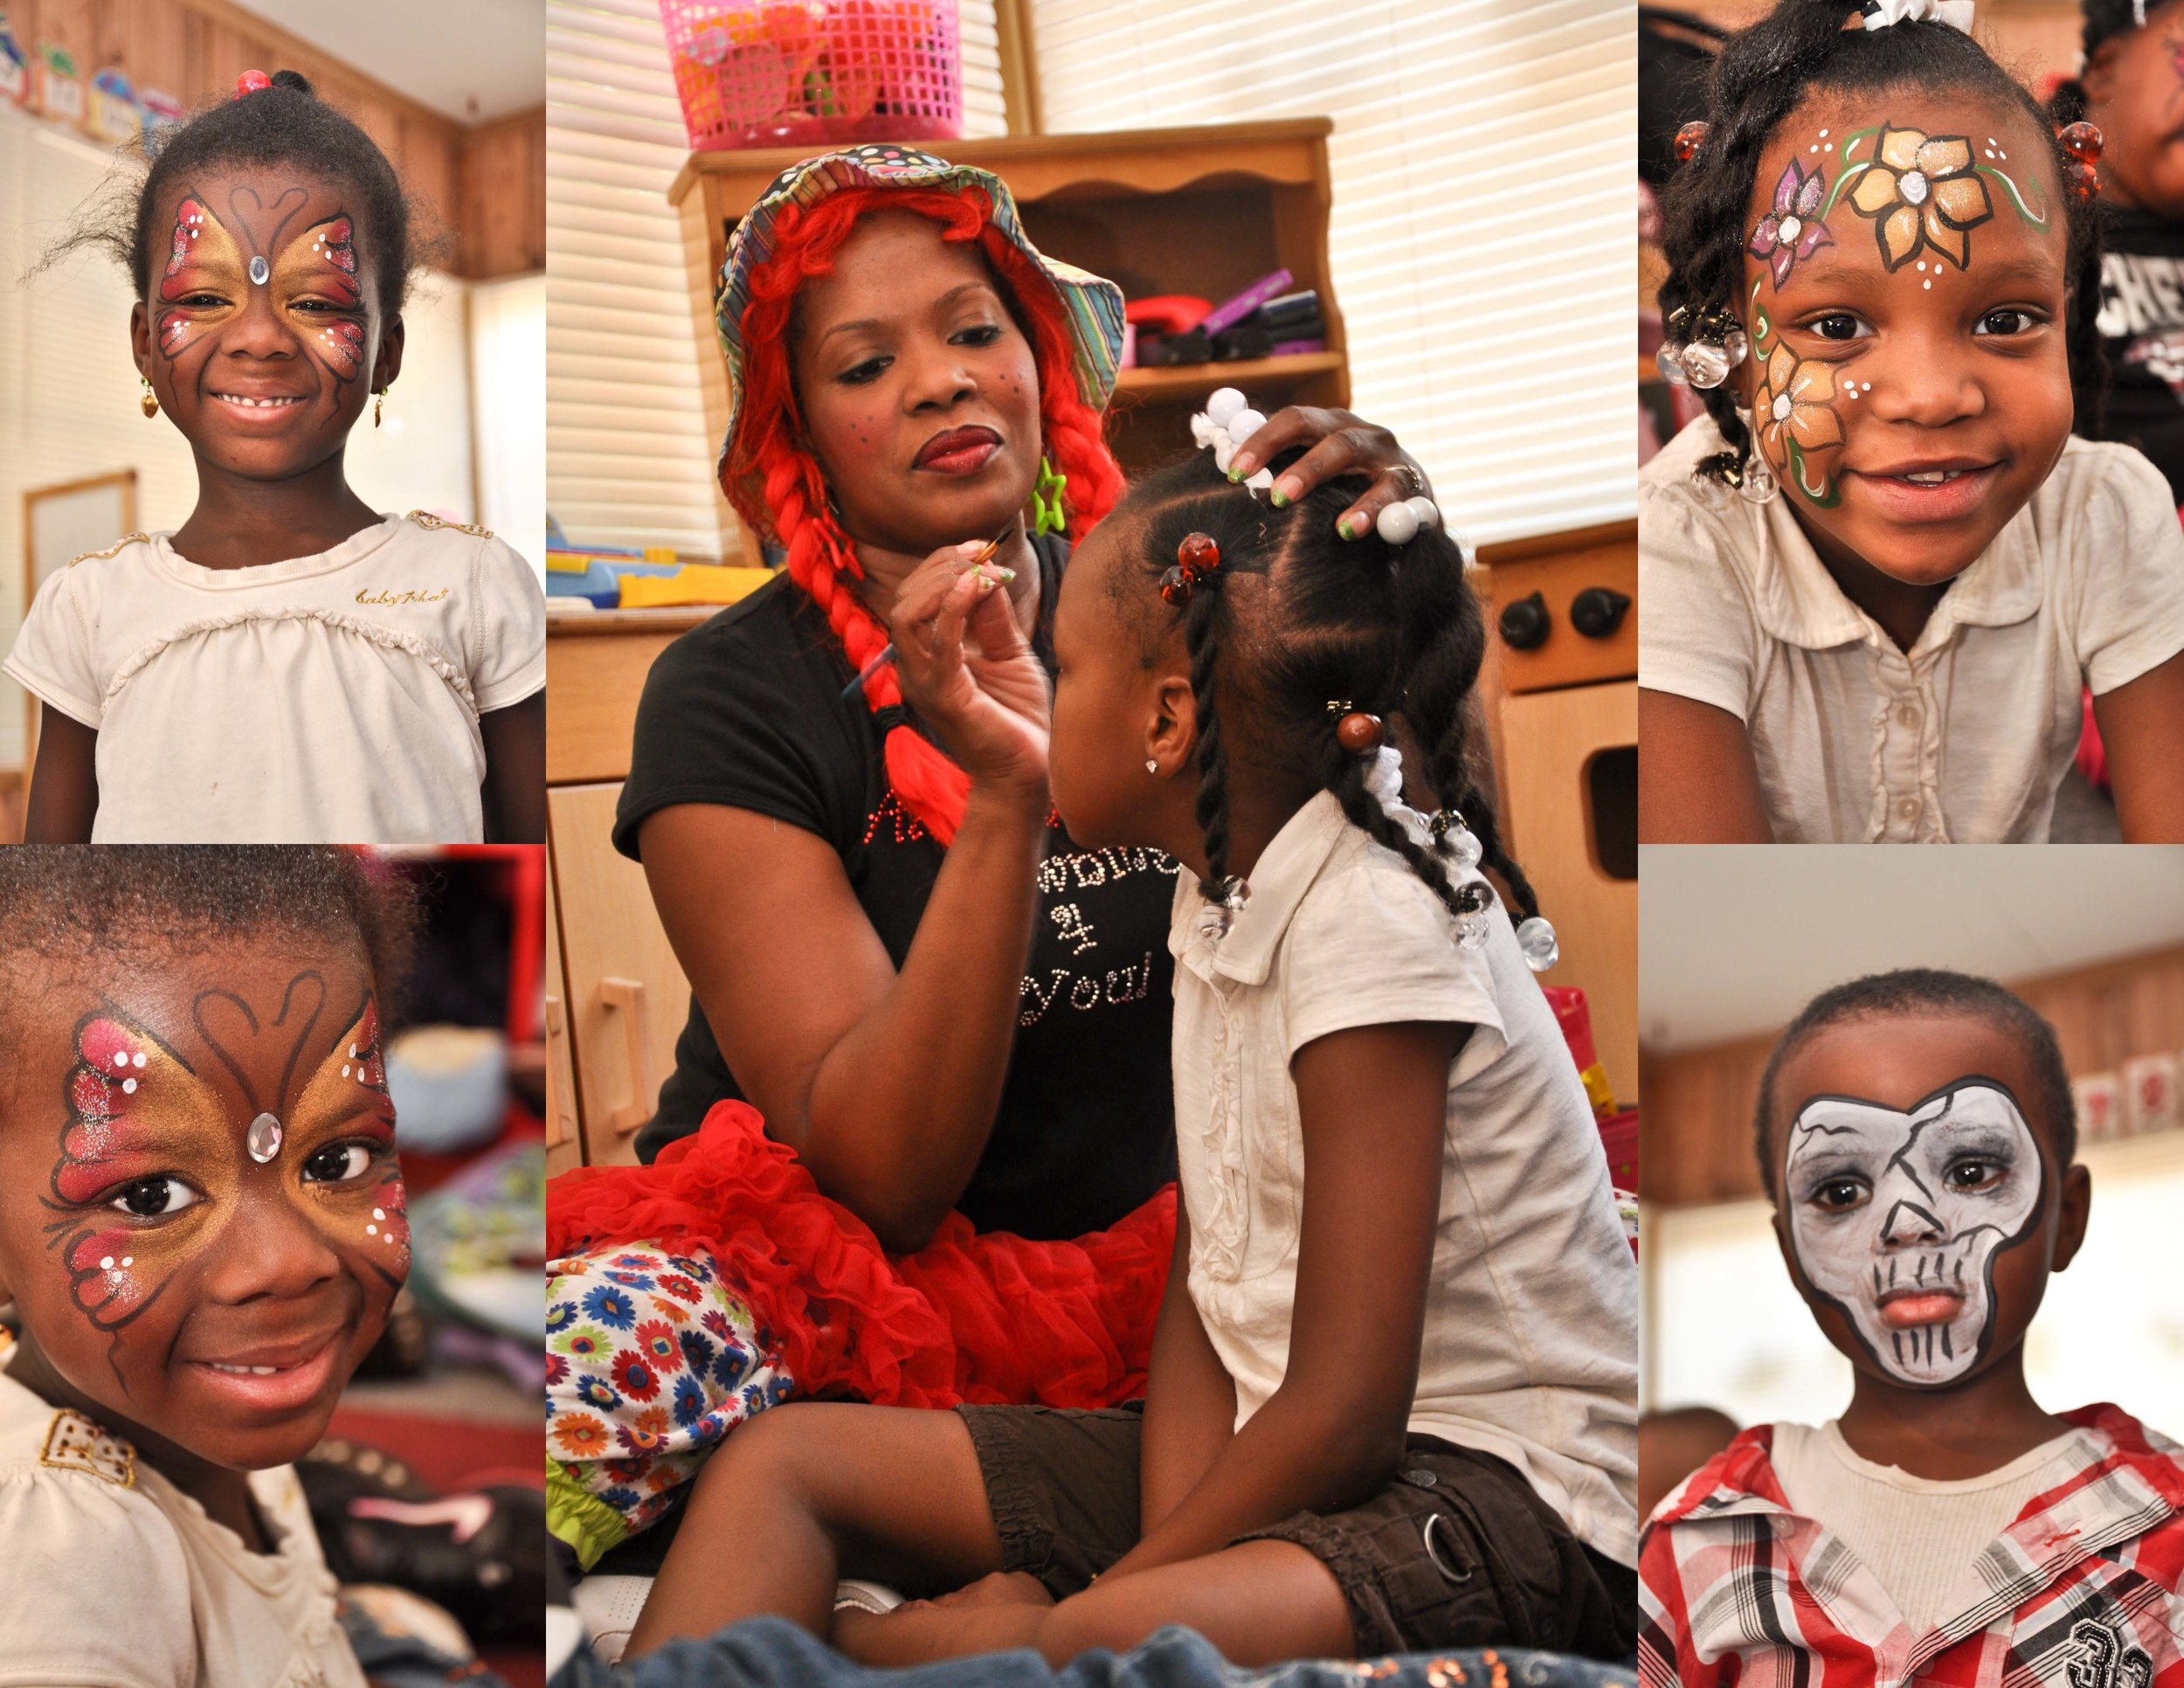 The Kustom Shop Custom party decorations Atlanta entertainment